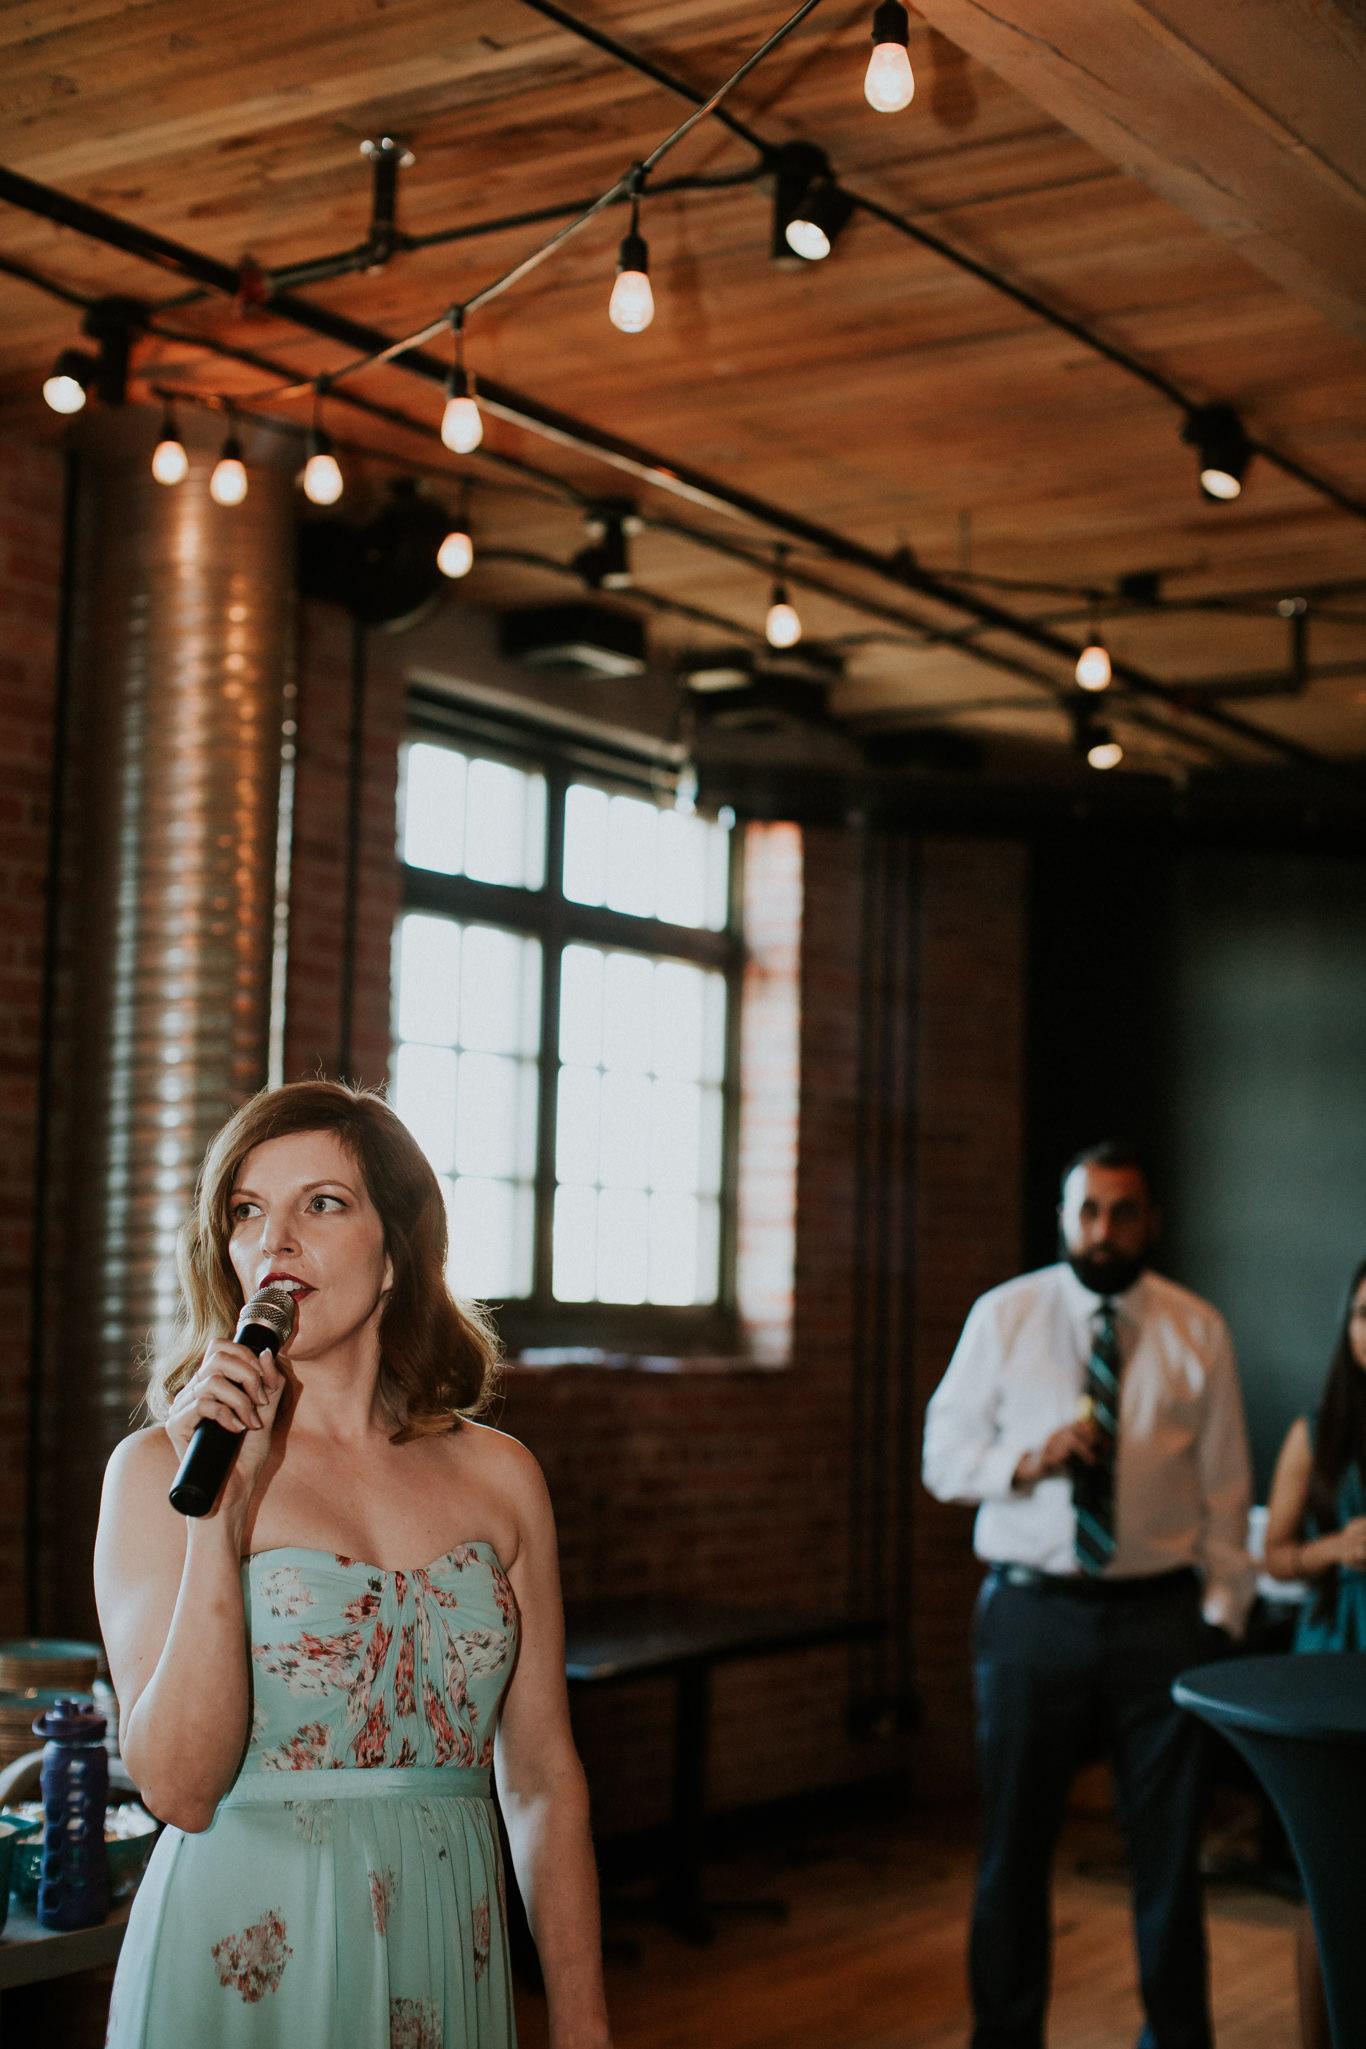 Lindsay-and-Heather-Charbar-Restaurant-Wedding-in-Calgary-148